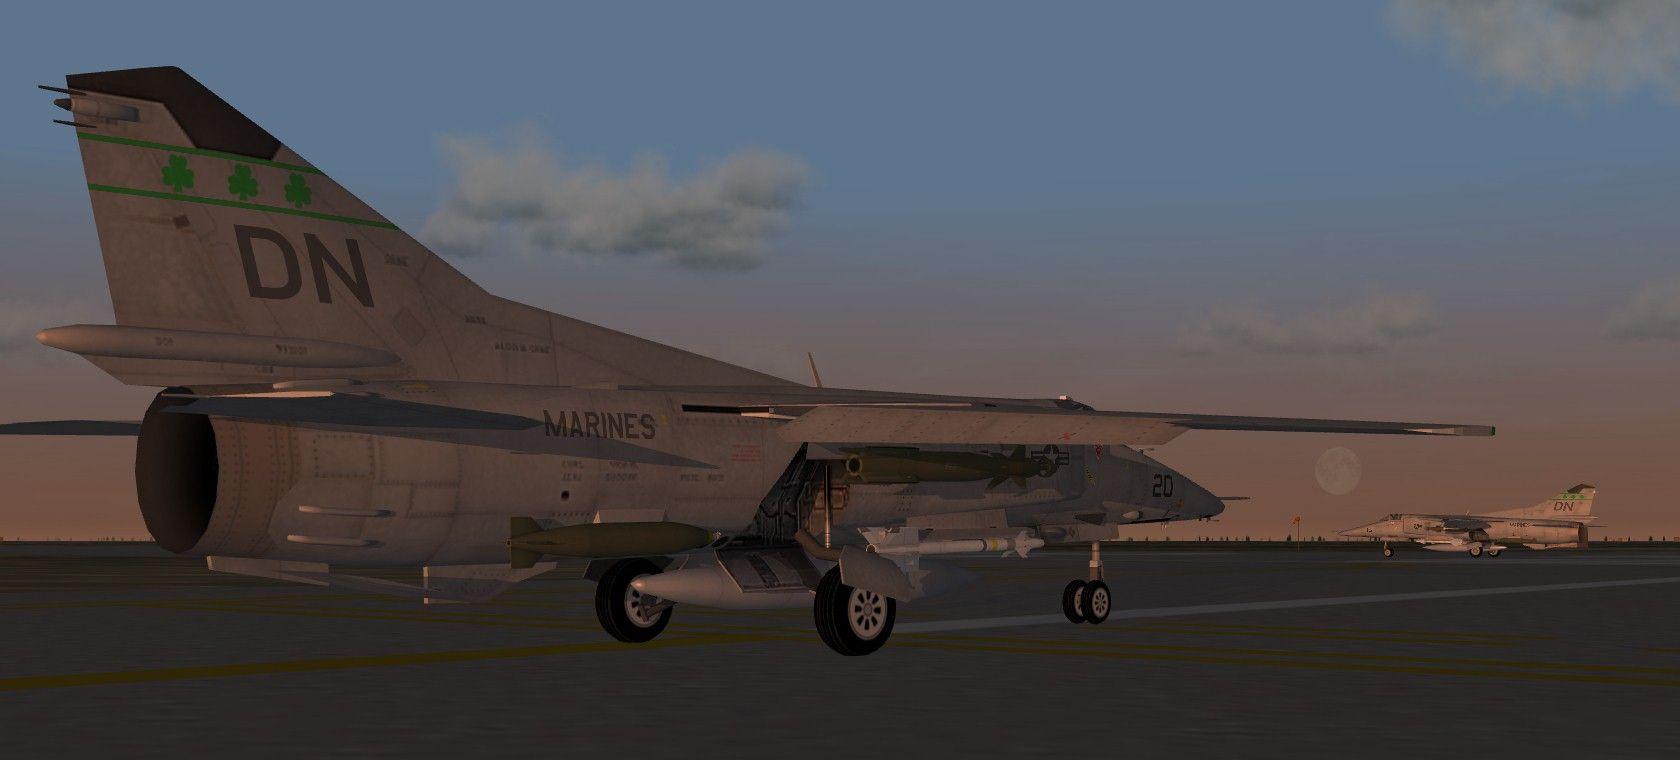 USMCF-7MTHUNDERPIG01.jpg